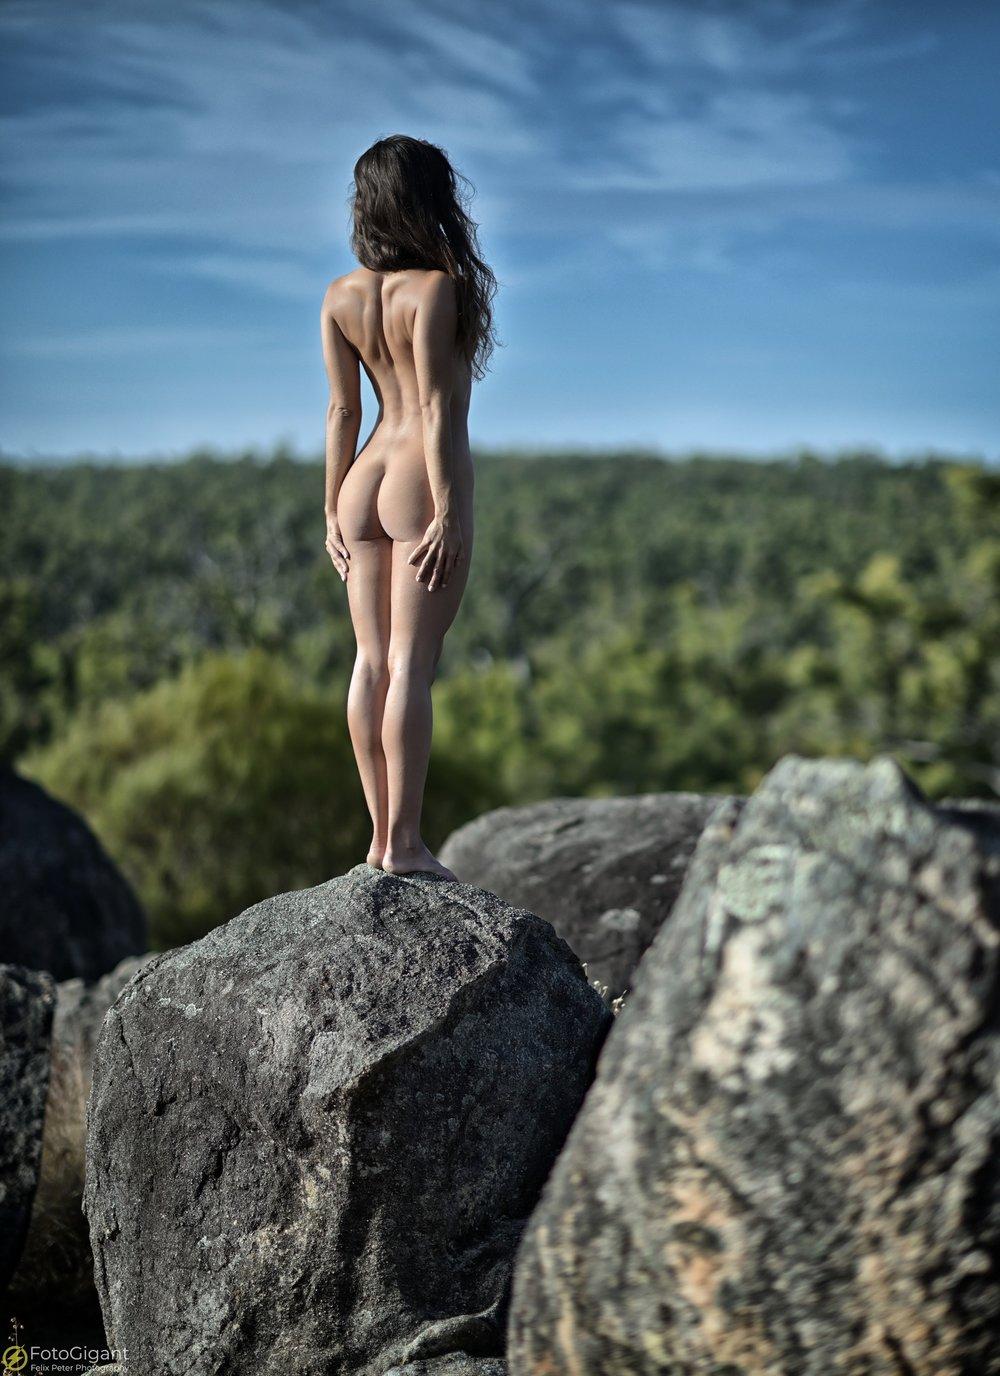 NudeArt_Aktfotografie_Eva-Luna_10.jpg